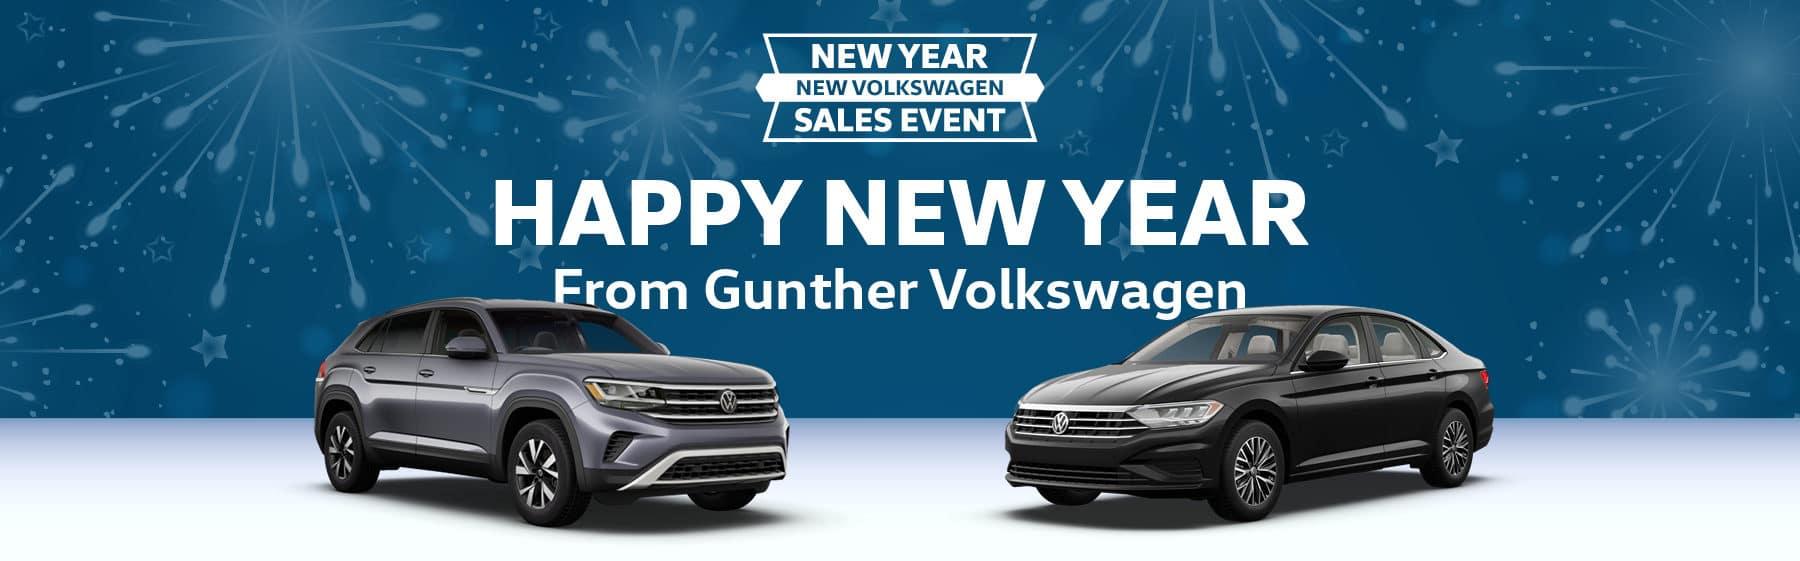 New year, new Volkswagen sales even. Happy new year from Gunther Volkswagen!